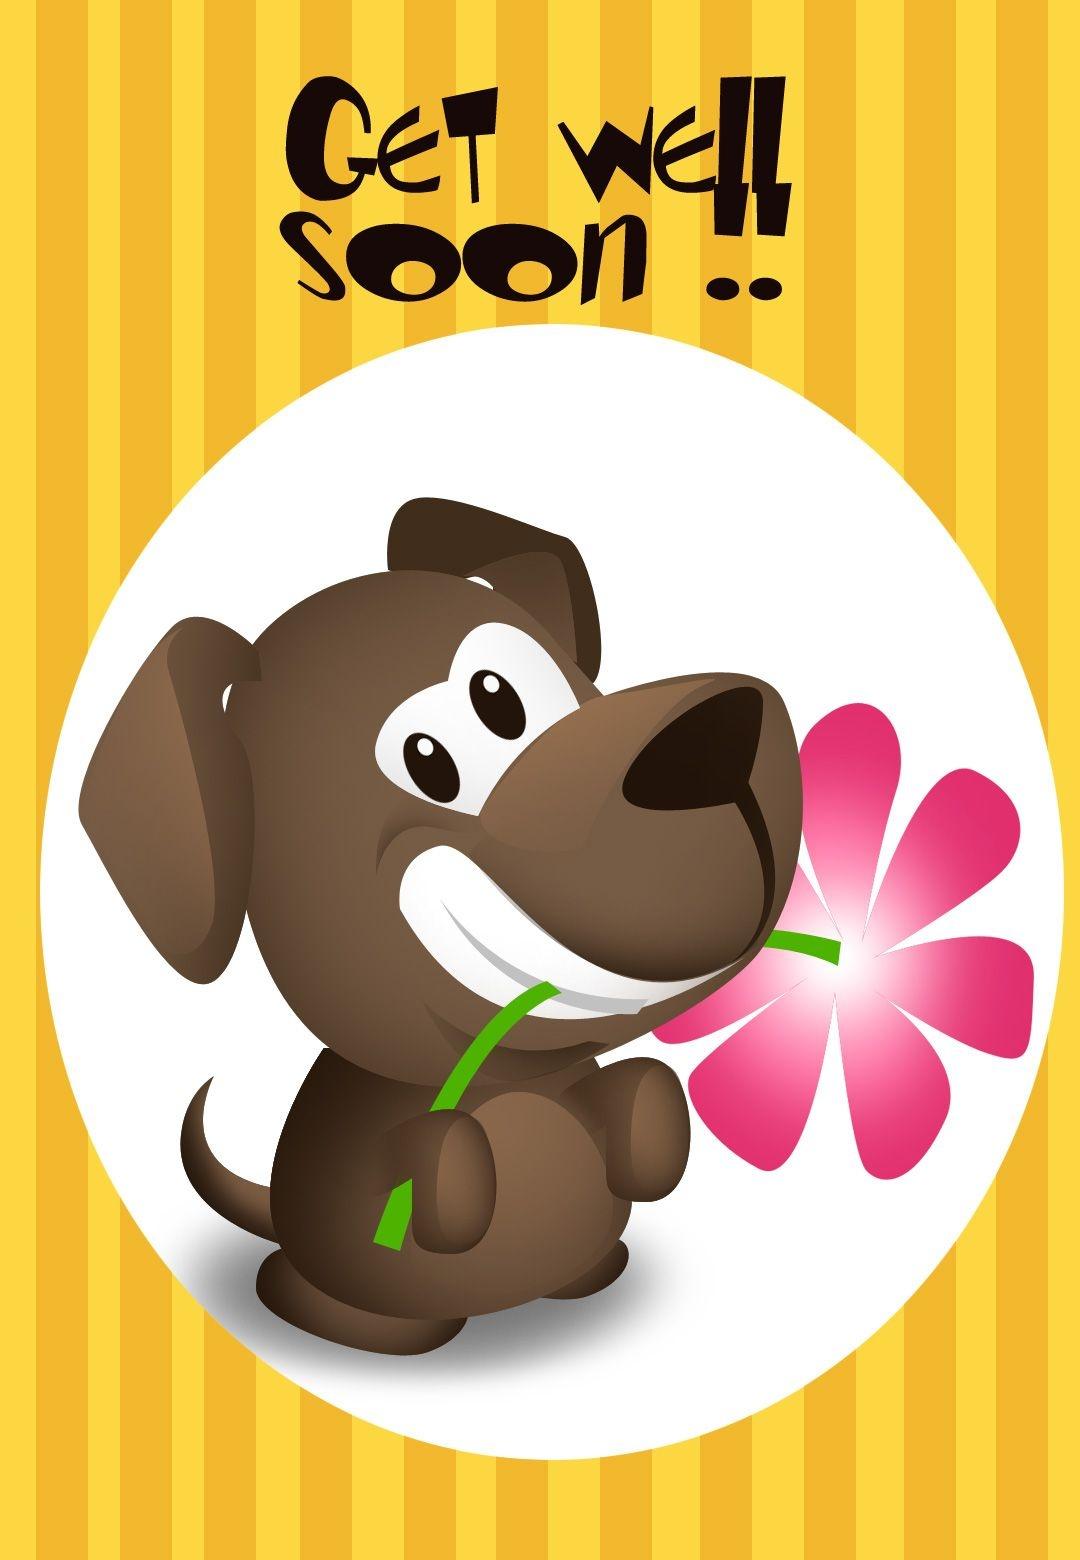 Get Well Soon Puppy Greeting Card   * Prenten 18/ Beterschap - Sterkte * - Free Printable Get Well Soon Cards